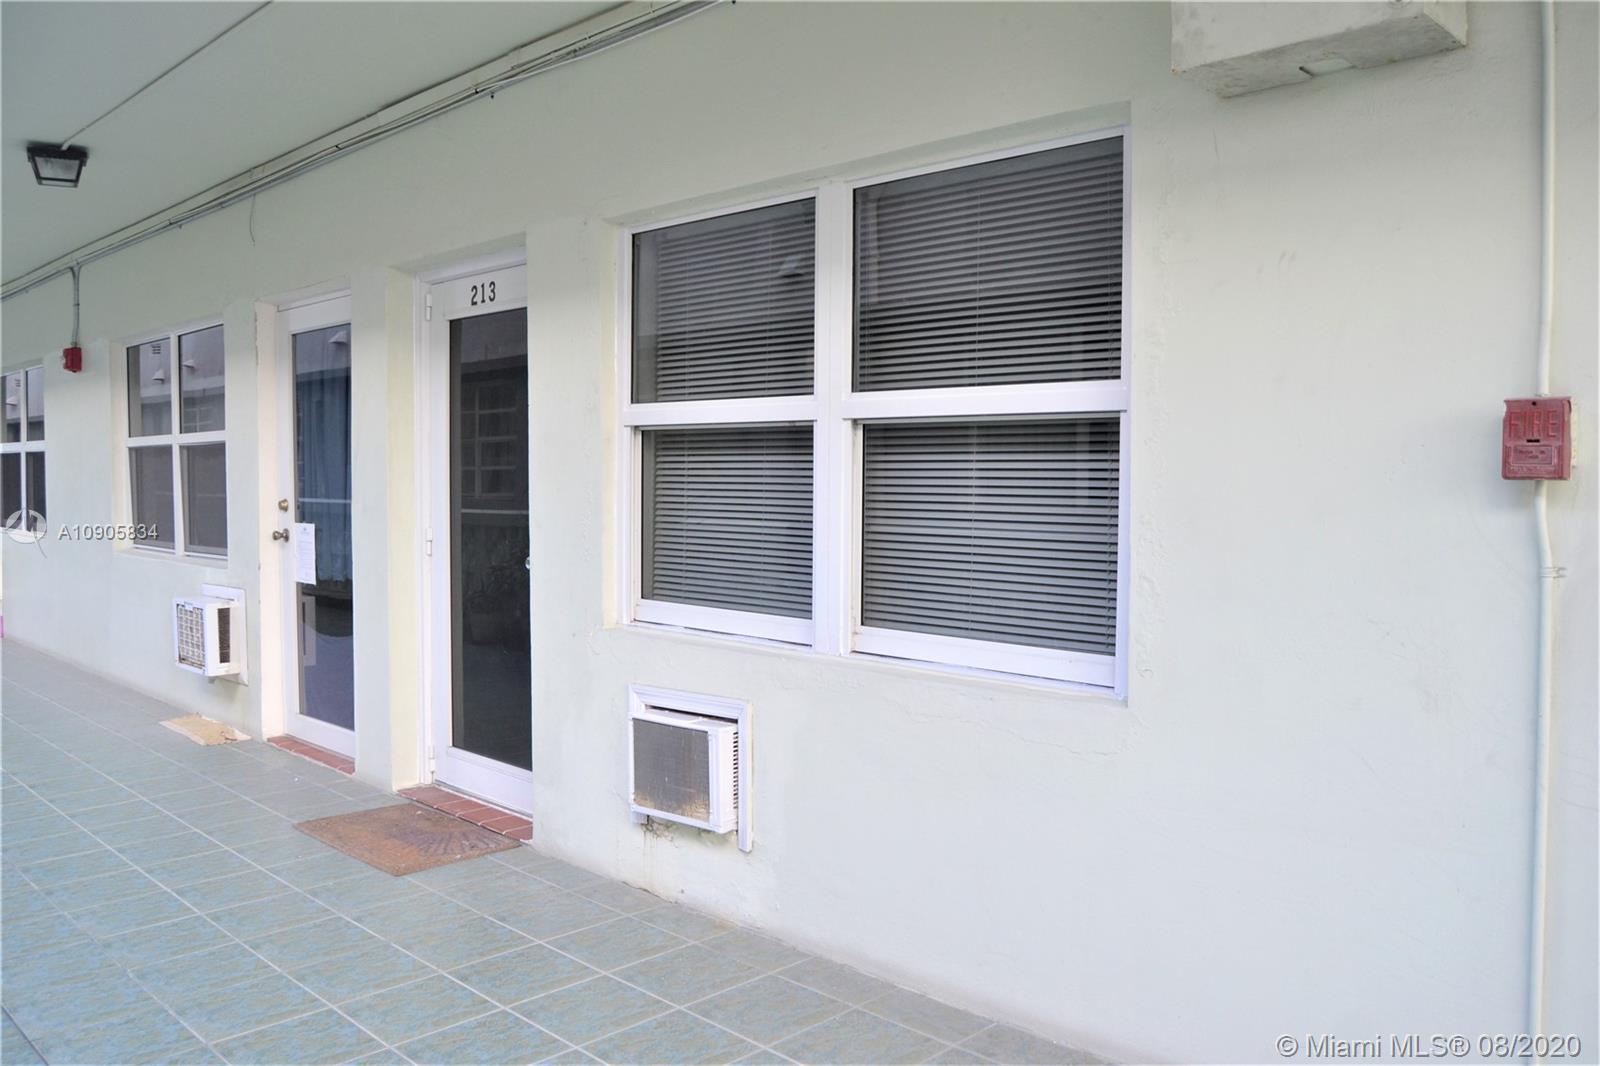 524  Washington Ave #213 For Sale A10905834, FL